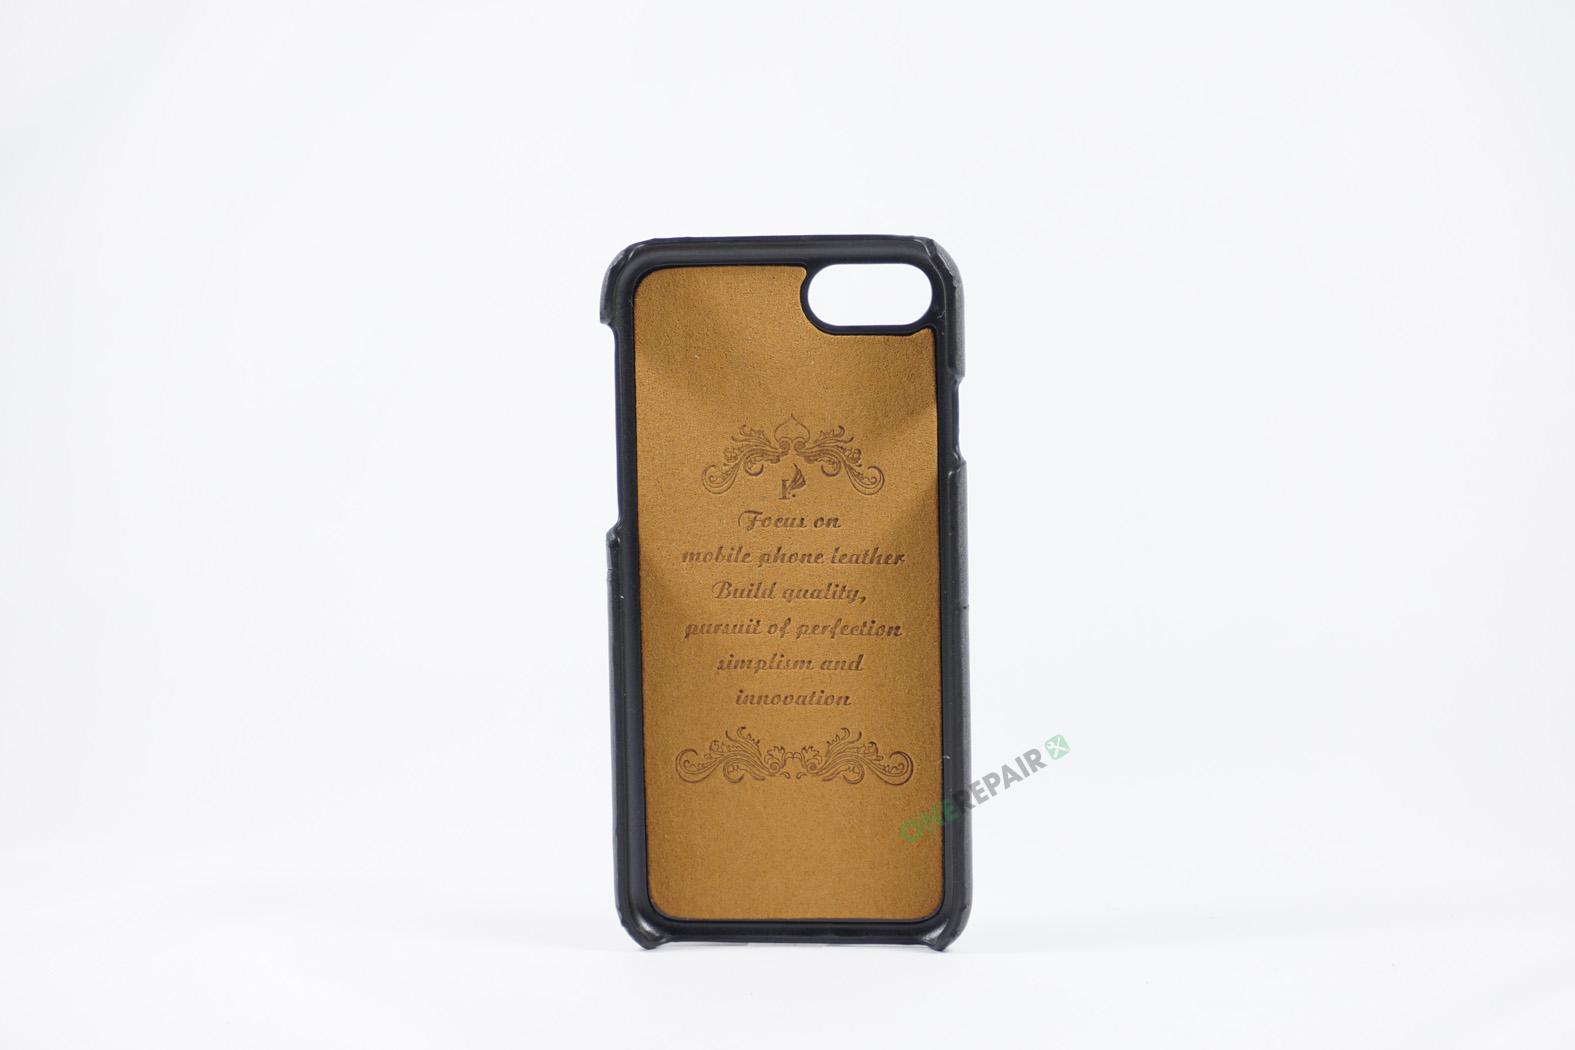 350738_iPhone_7_8_Laeder_Kortholder_Cover_Graa_OneRepair_WM_00003